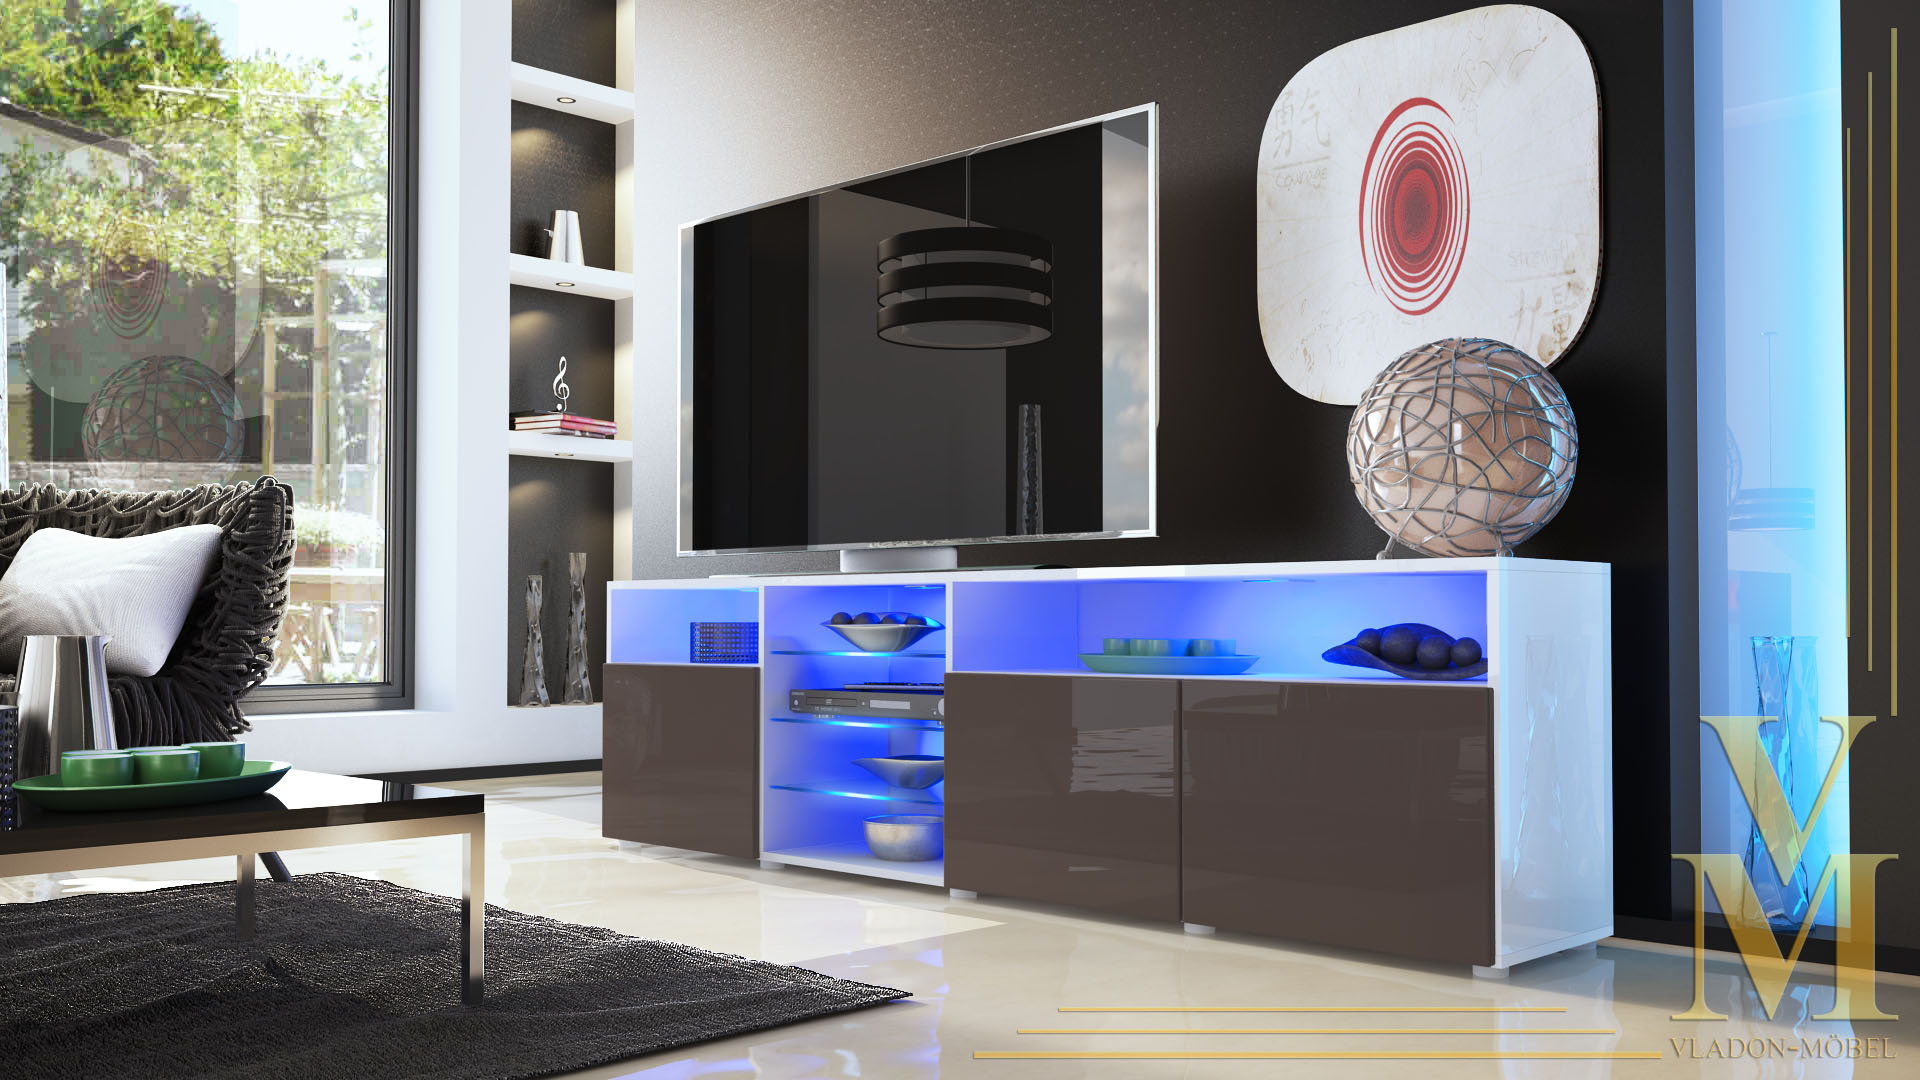 lowboard sideboard tv board tisch rack granada v2 wei hochglanz naturt ne ebay. Black Bedroom Furniture Sets. Home Design Ideas